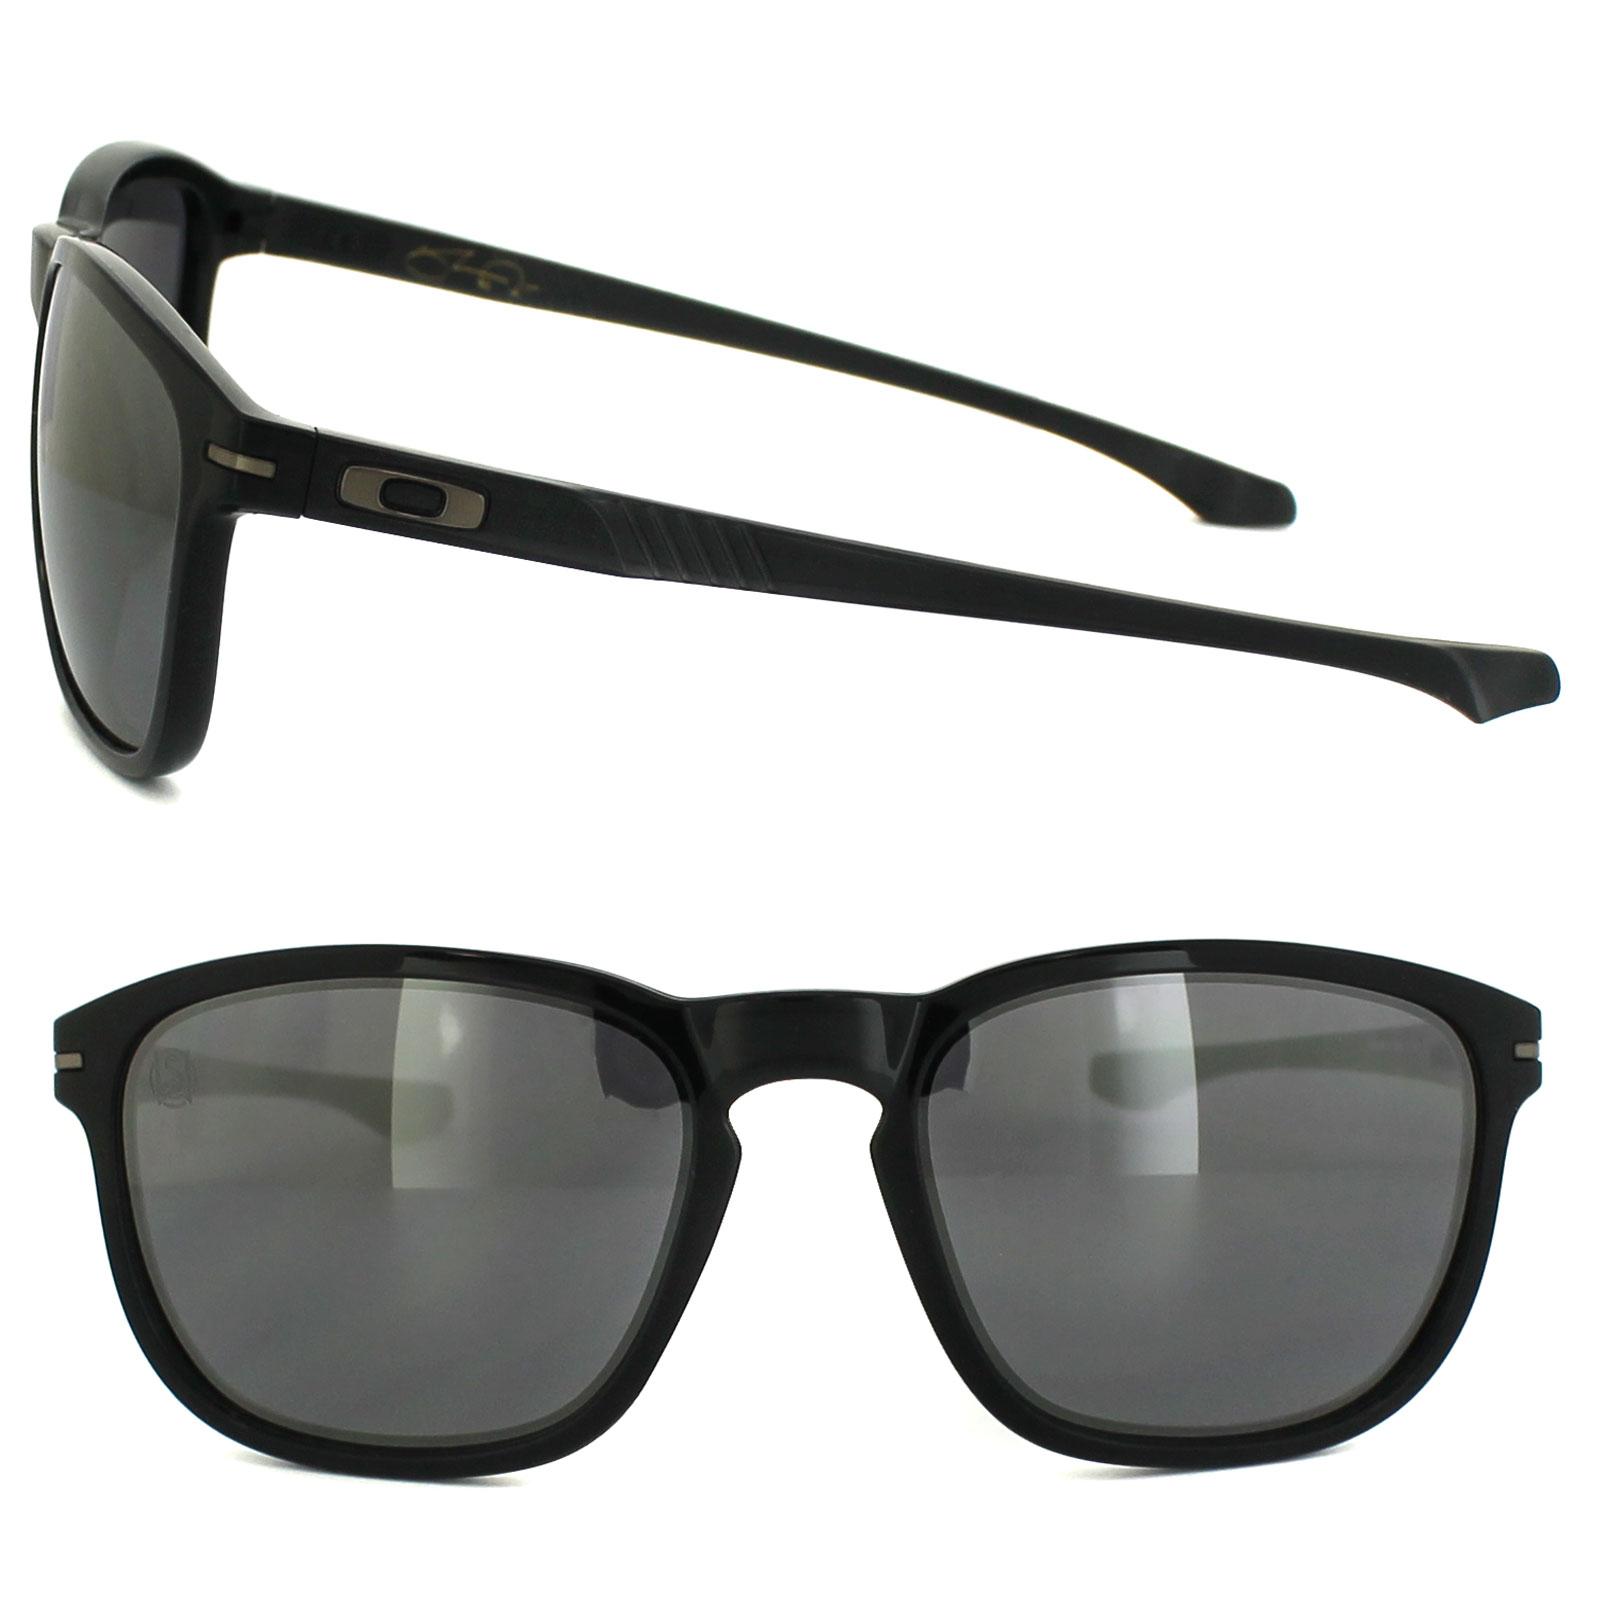 black and white oakley sunglasses coou  Sentinel Oakley Sunglasses Enduro OO9223-03 Black Ink Black Iridium